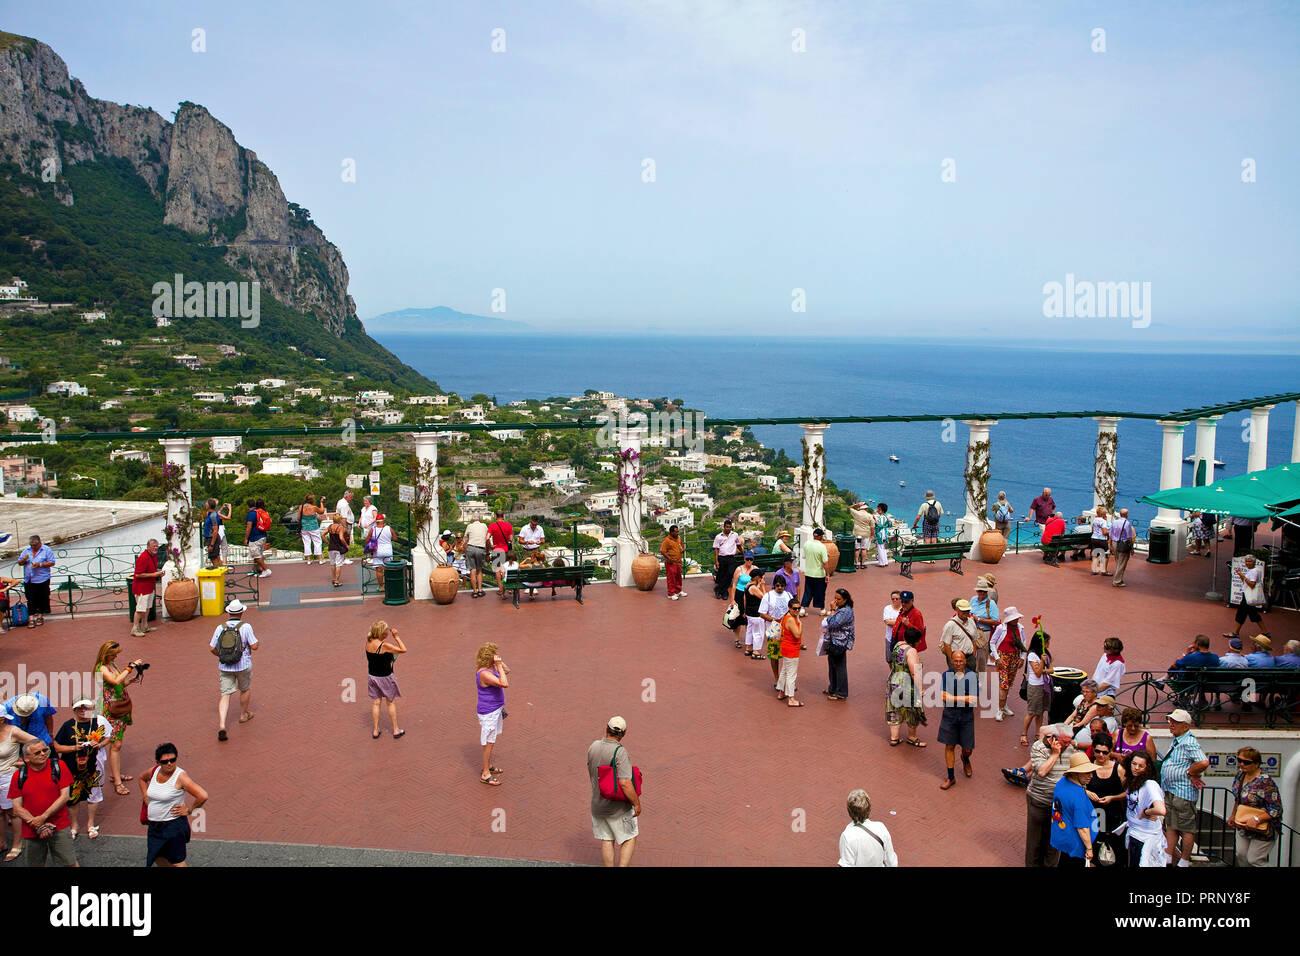 Tourists at panorama terrace, Piazza Umberto I, Capri island, Gulf of Naples, Campania, Italy - Stock Image